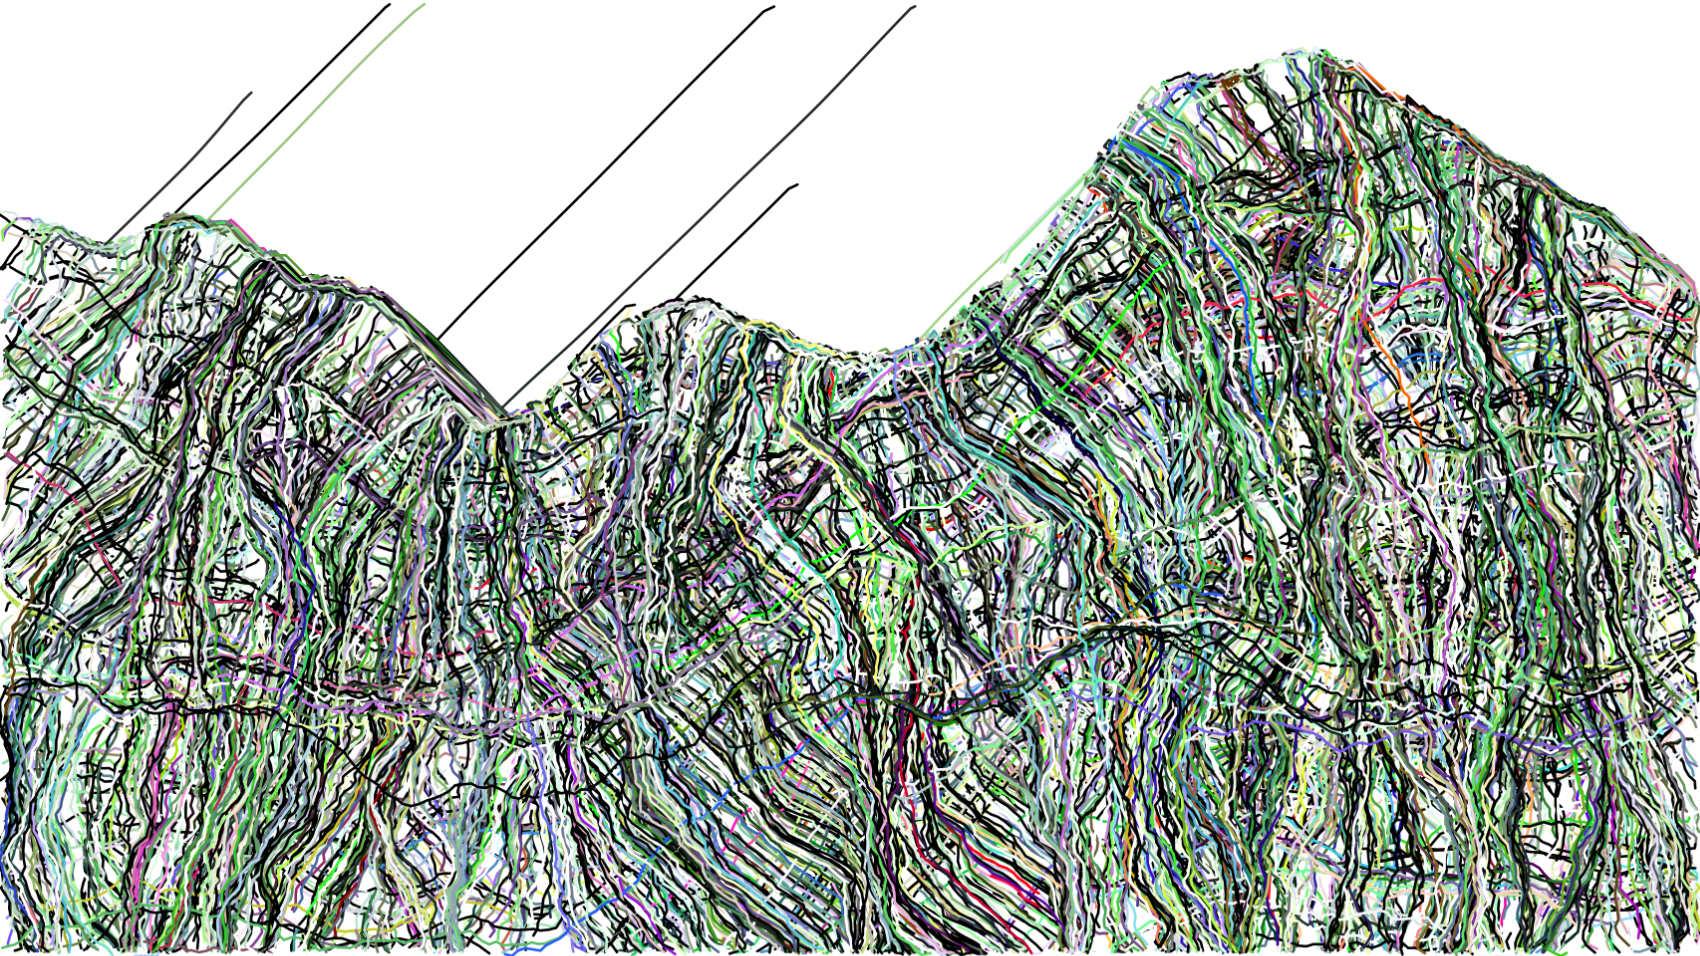 landscape data, 2018, inkjet on fine art paper